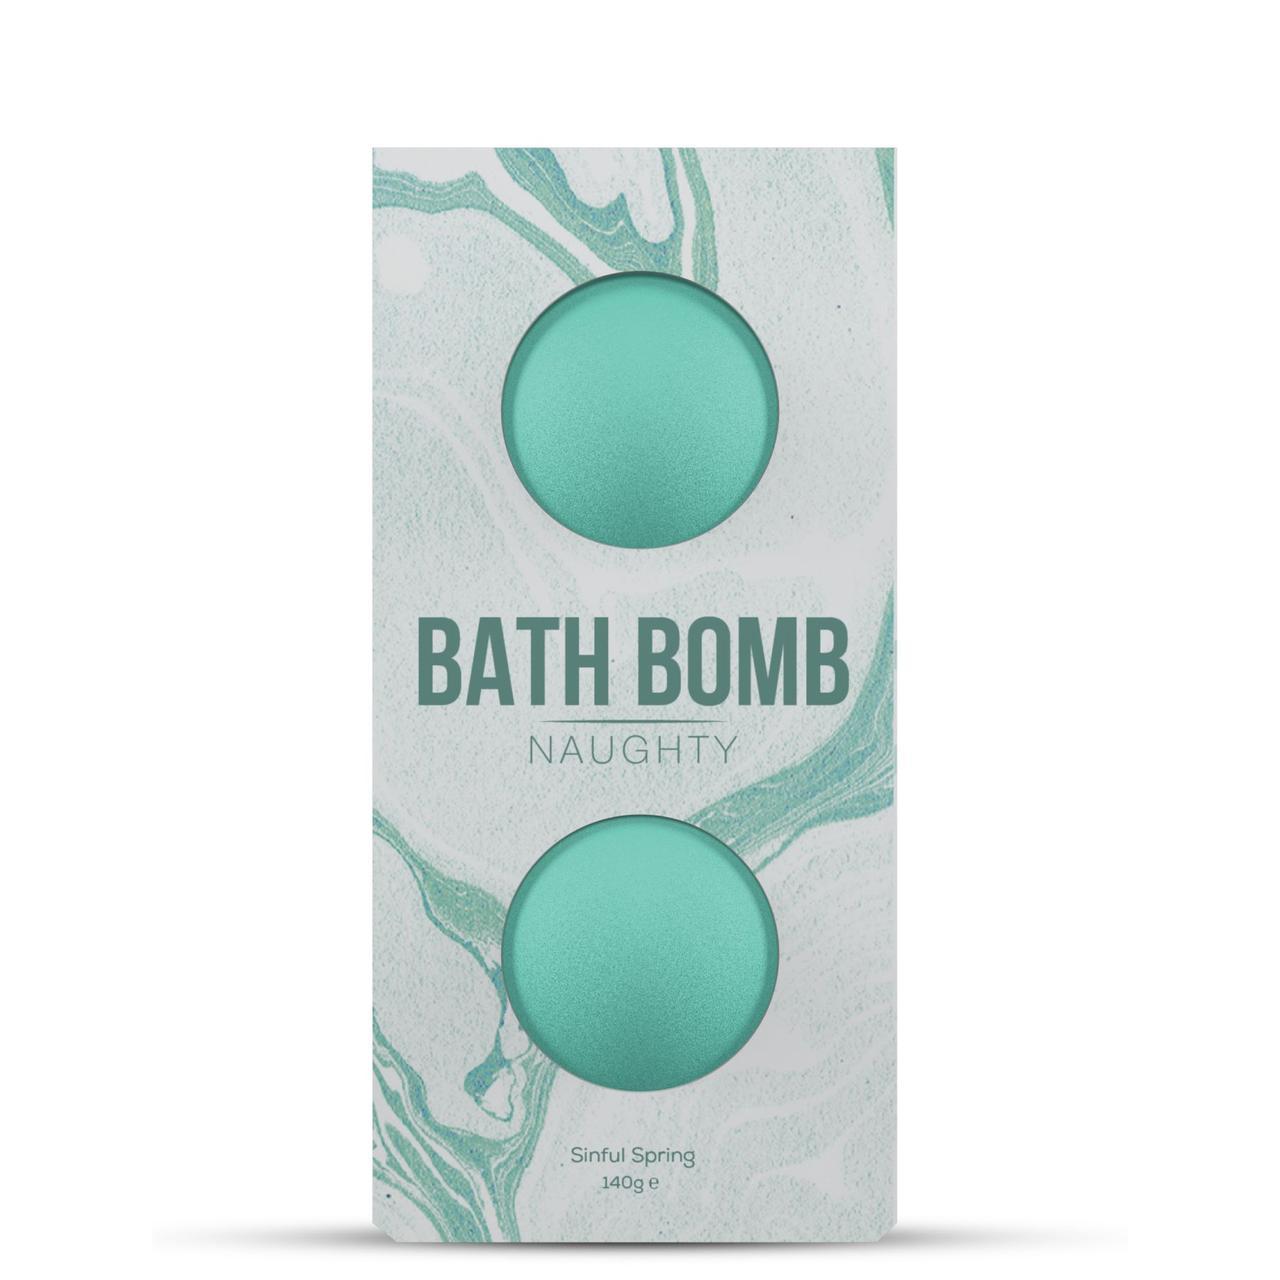 Набор бомбочек для ванны Dona Bath Bomb Naughty Sinful Spring (140 гр) с афродизиаками и феромонами